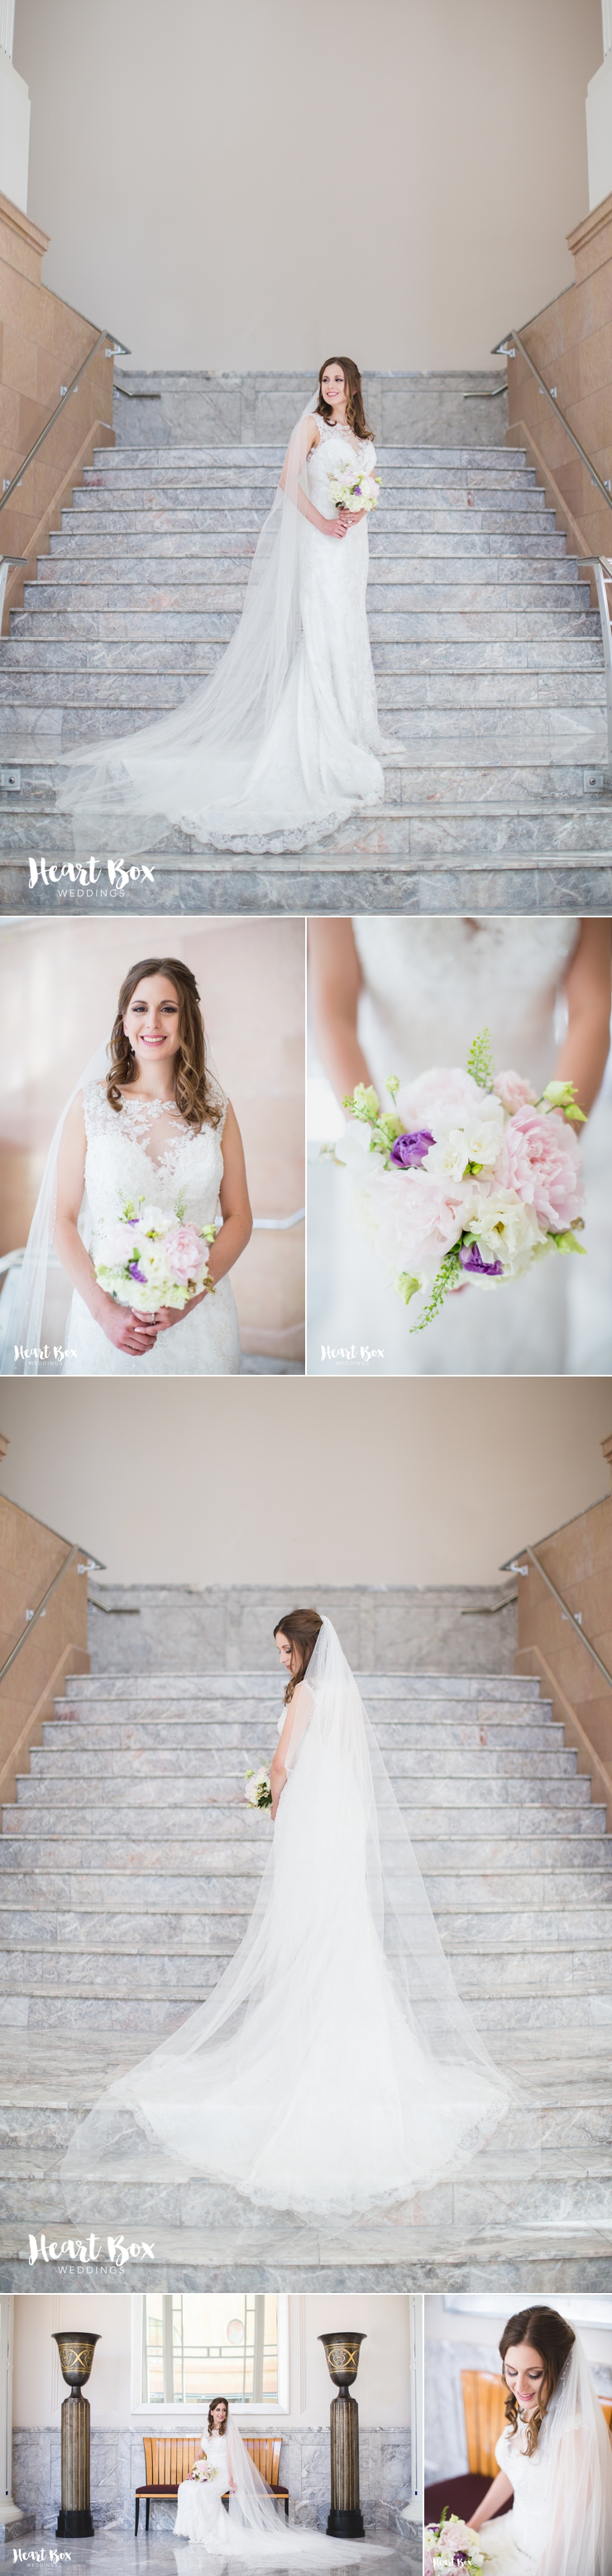 Sarah Lubrano Bridal Blog Collages 1.jpg